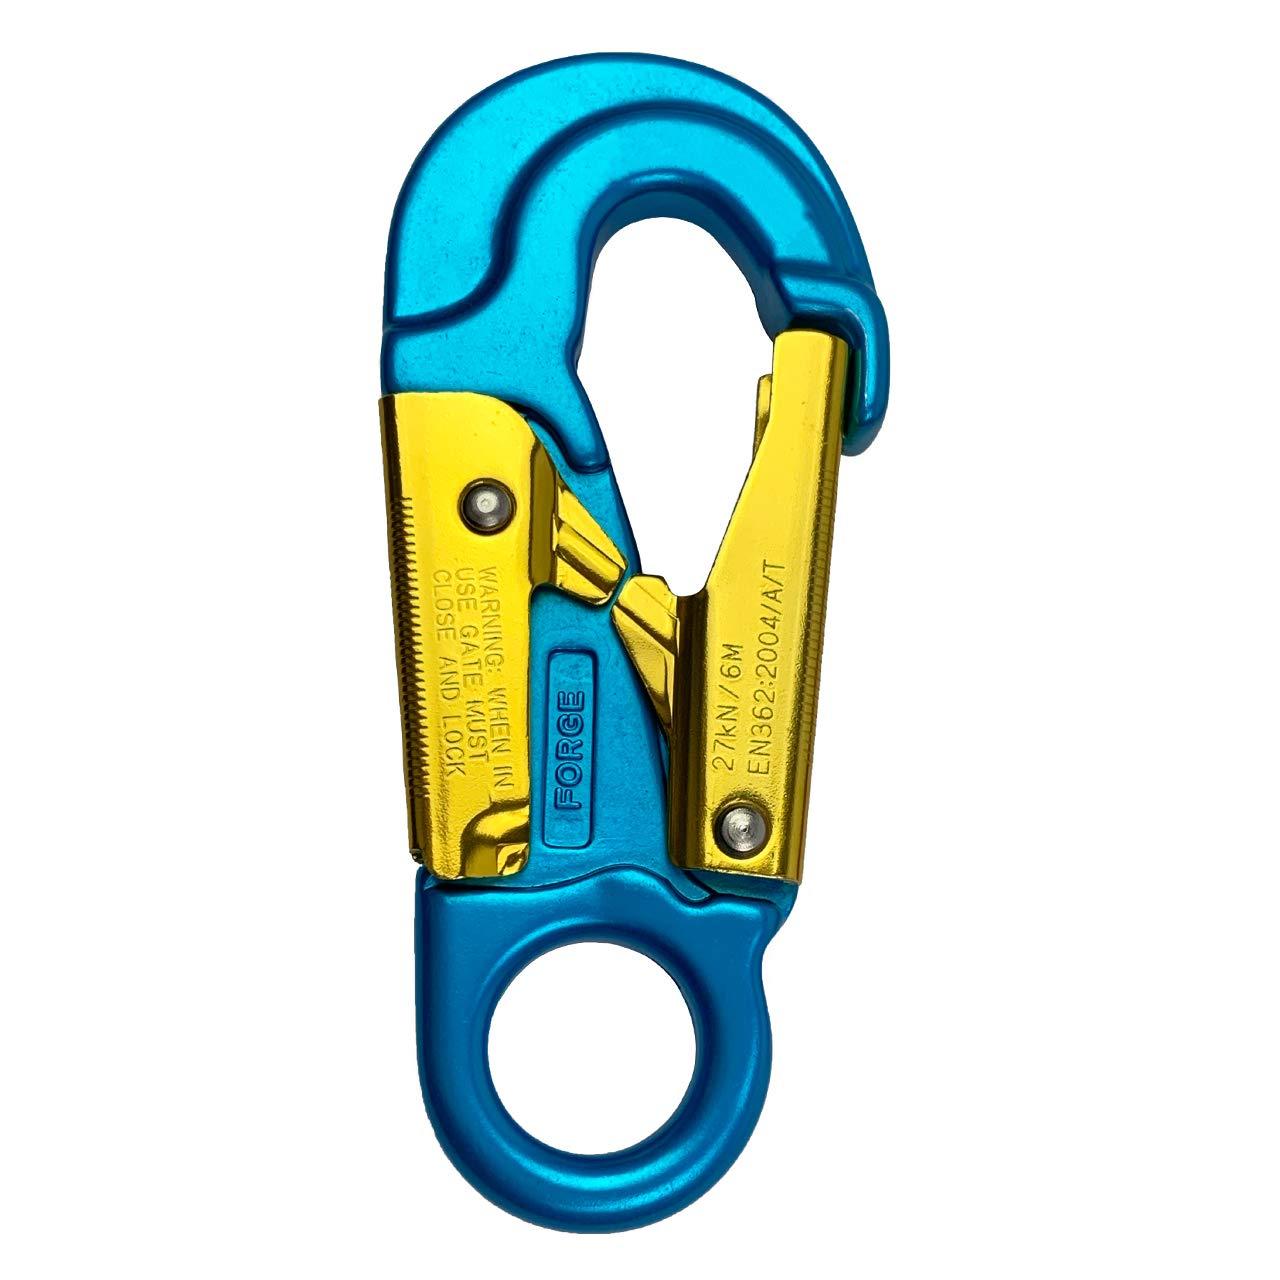 ProClimb Forged Aluminum Snaphook - Double Action Self Locking Gate, Captive Eye 27 kN - Blue by ProClimb